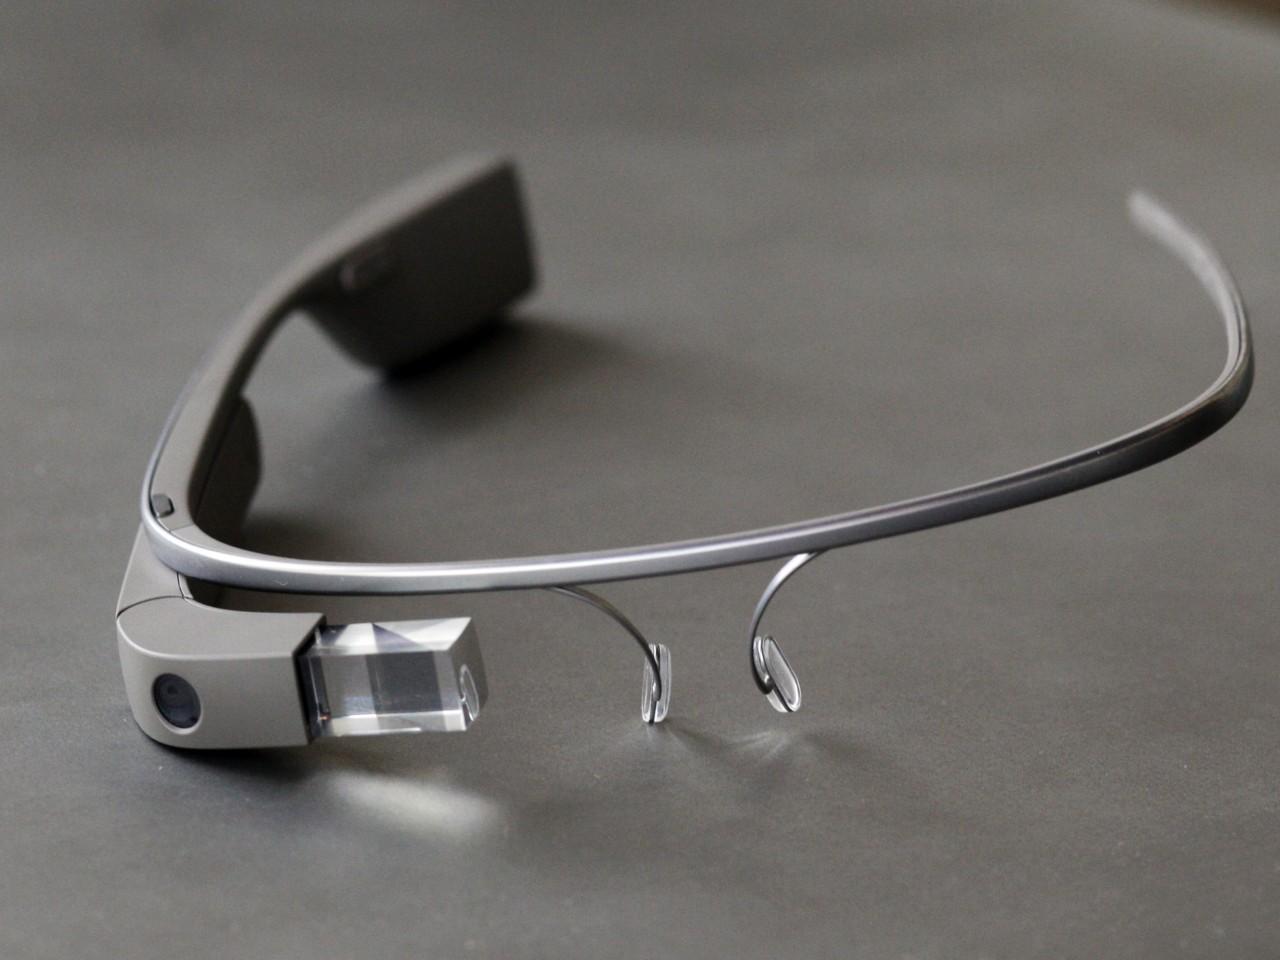 digital-life-google-glass-early-users.jpeg2-1280x960.jpg